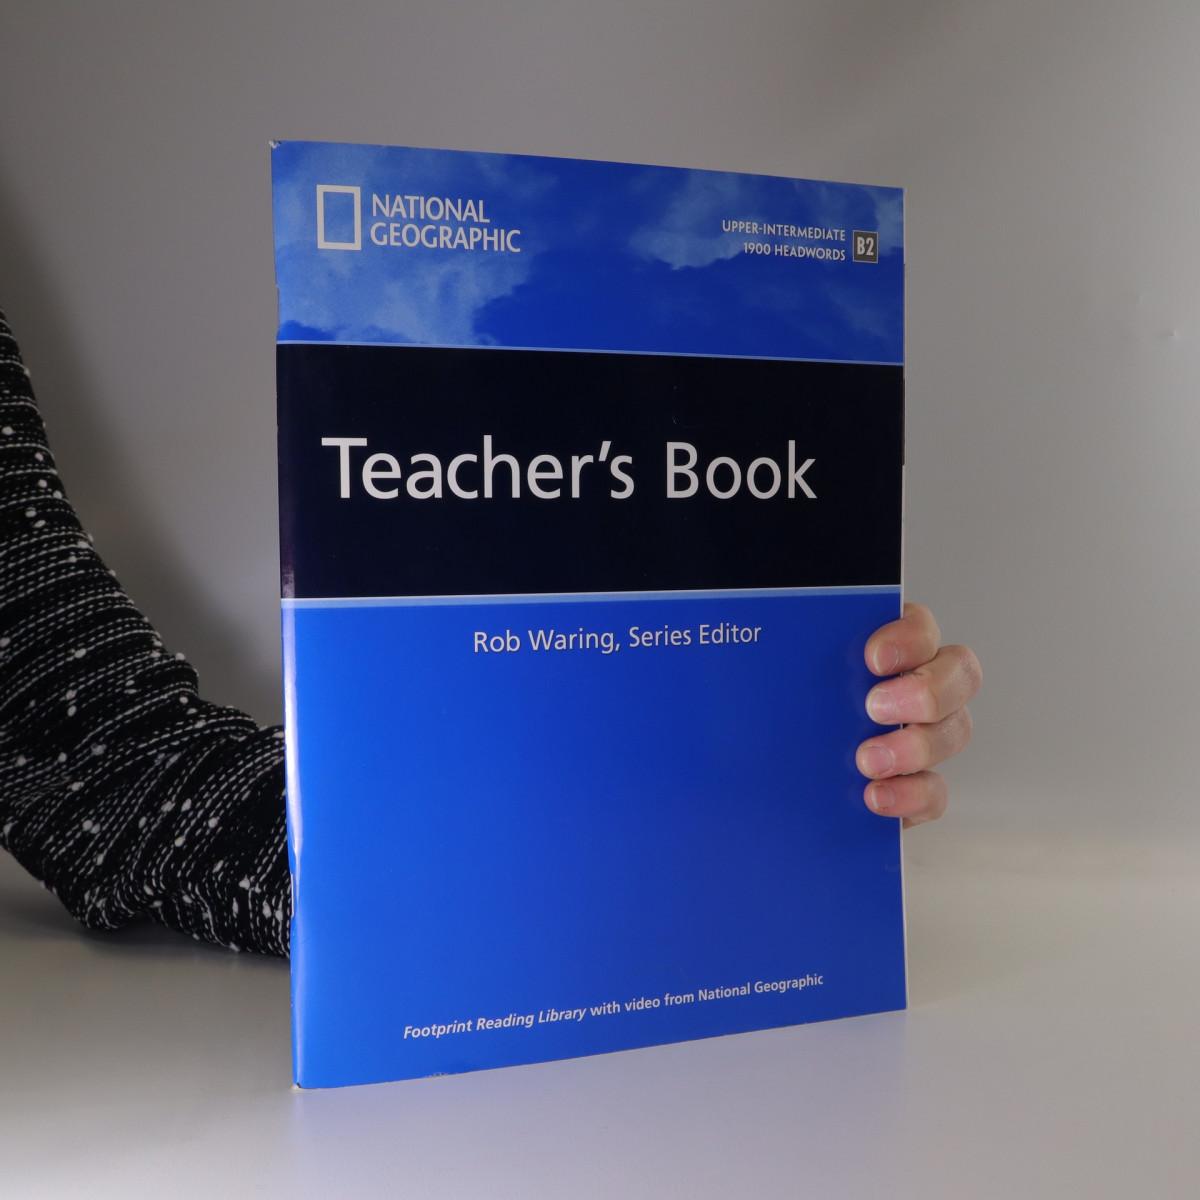 antikvární kniha Footprint Reading Library, Teacher's book, Upper-Intermediate/1900 Headwords /B2, neuveden